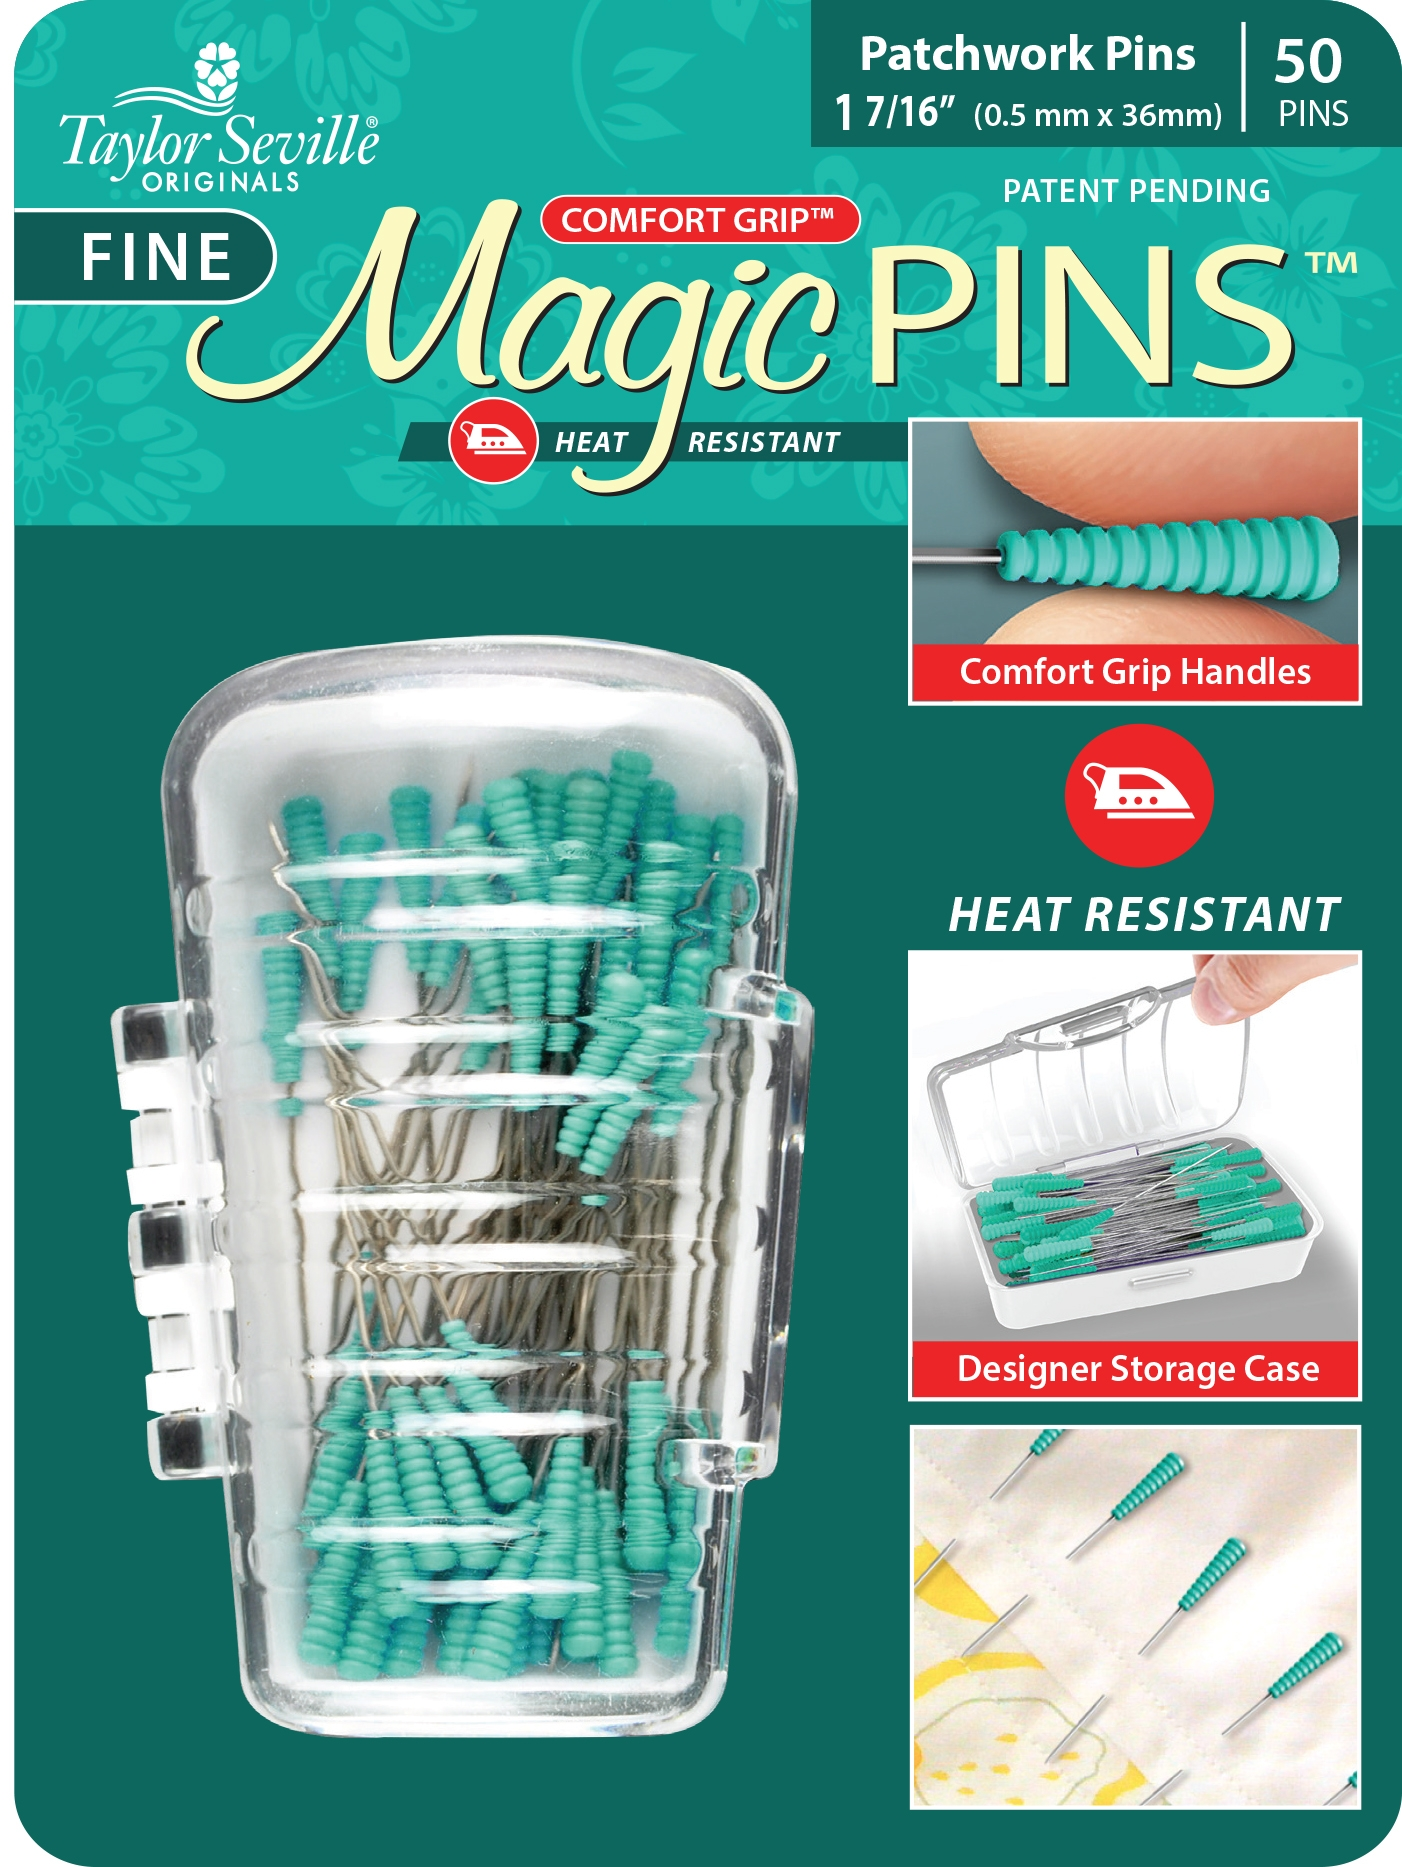 Fine Magic Pins Patchwork - 50 Pins